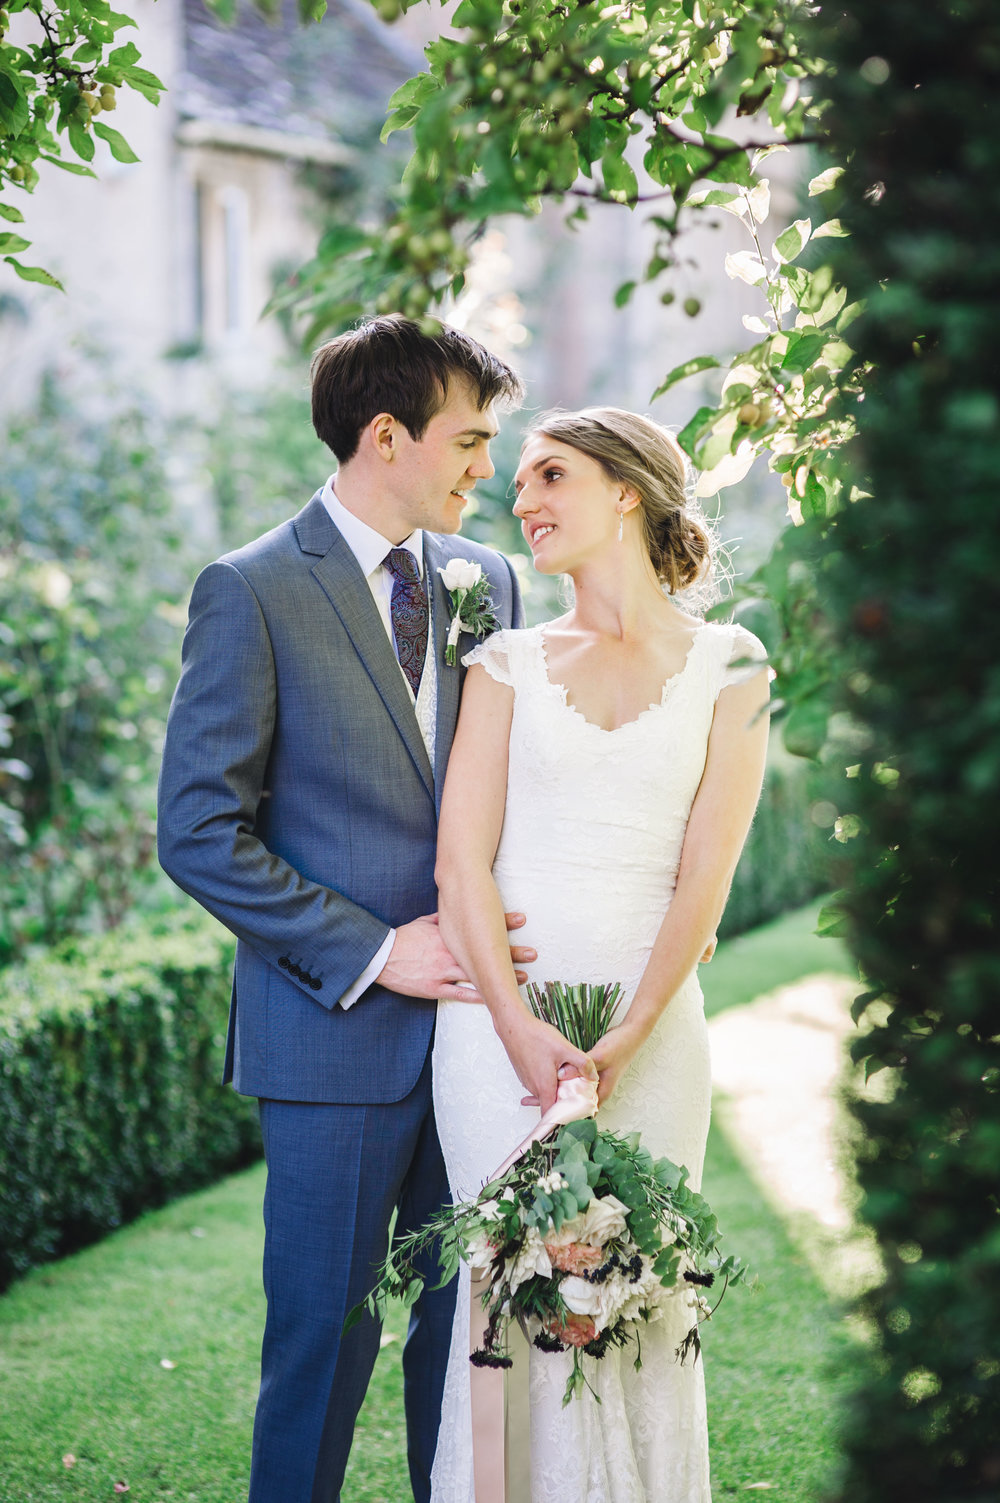 WIltshire weddings - Rachel and Chris (171 of 175).jpg